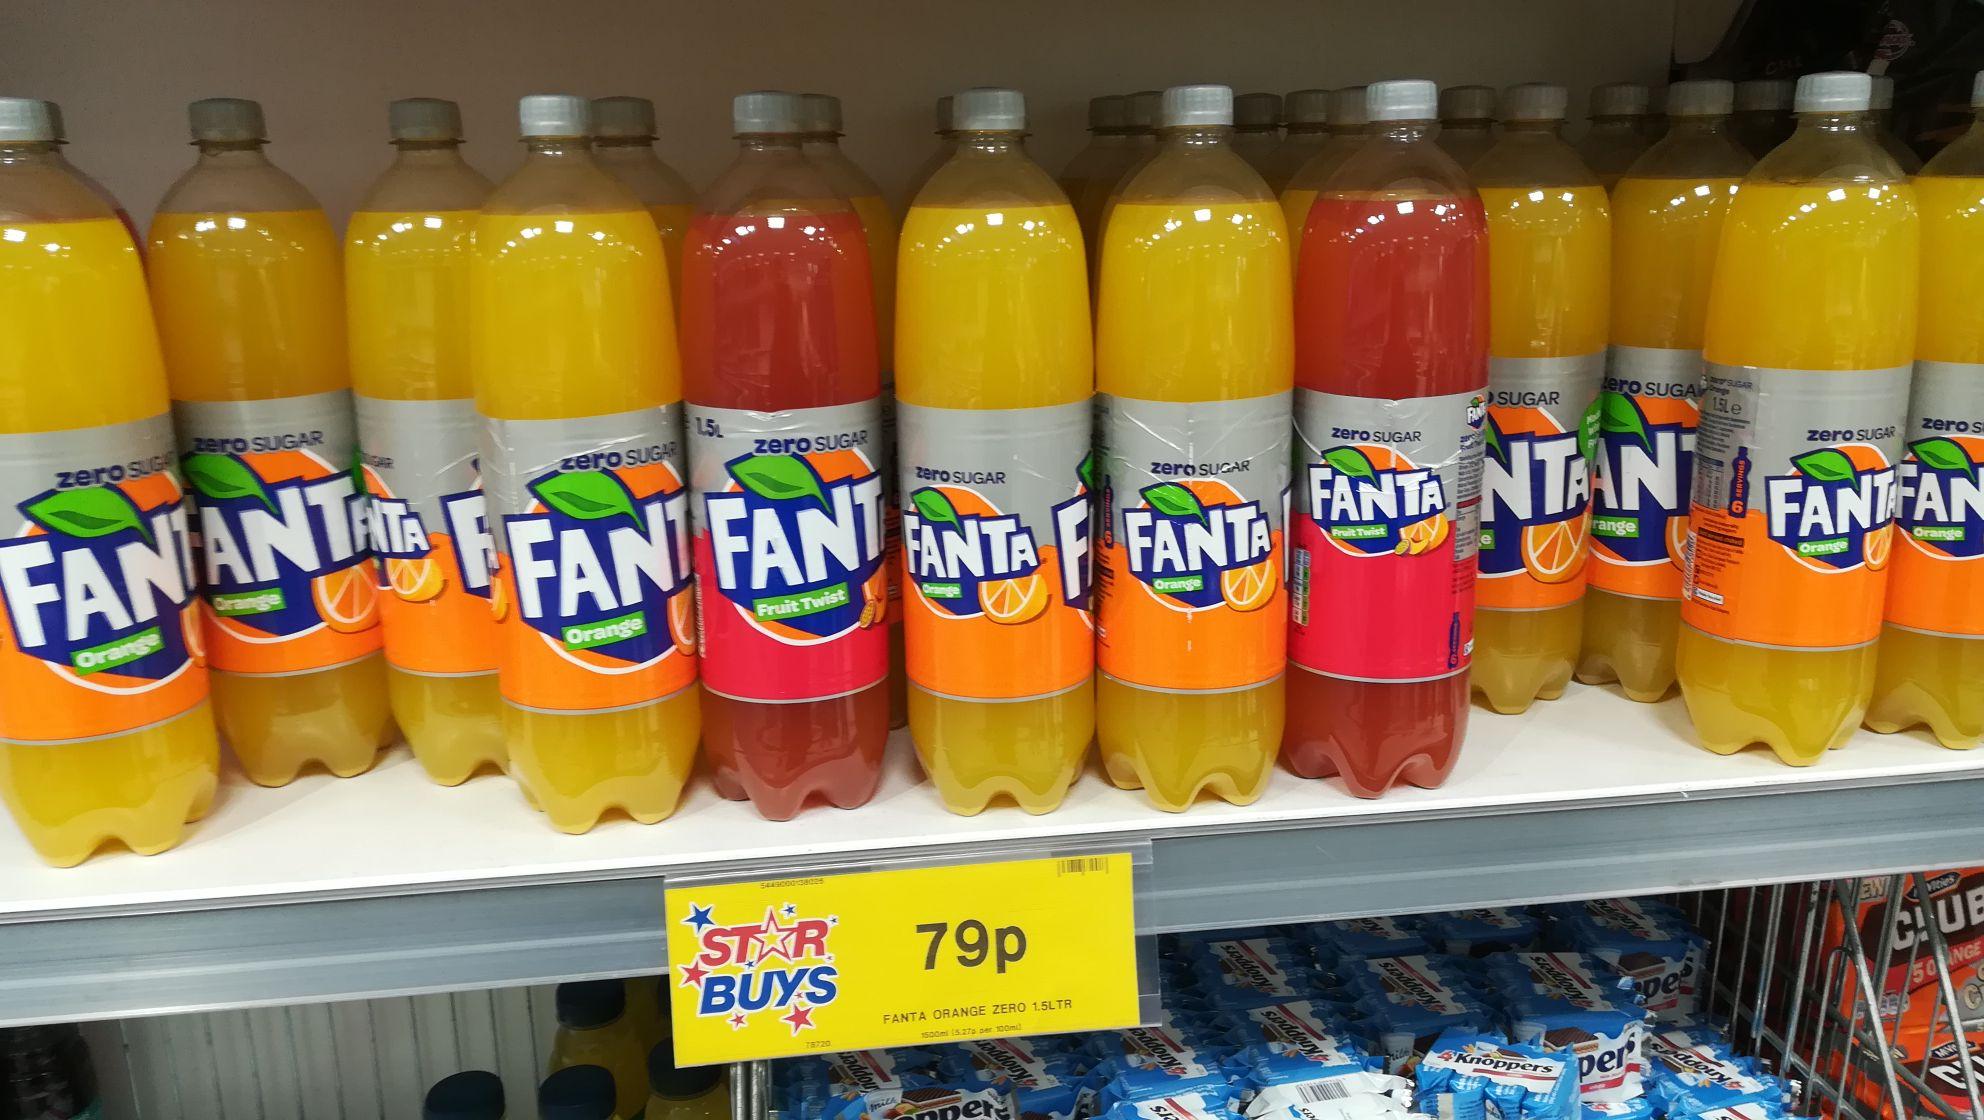 Fanta Zero Sugar - Orange / Fruit Twist - 1.5 litres - Home Bargains In-store - 79p